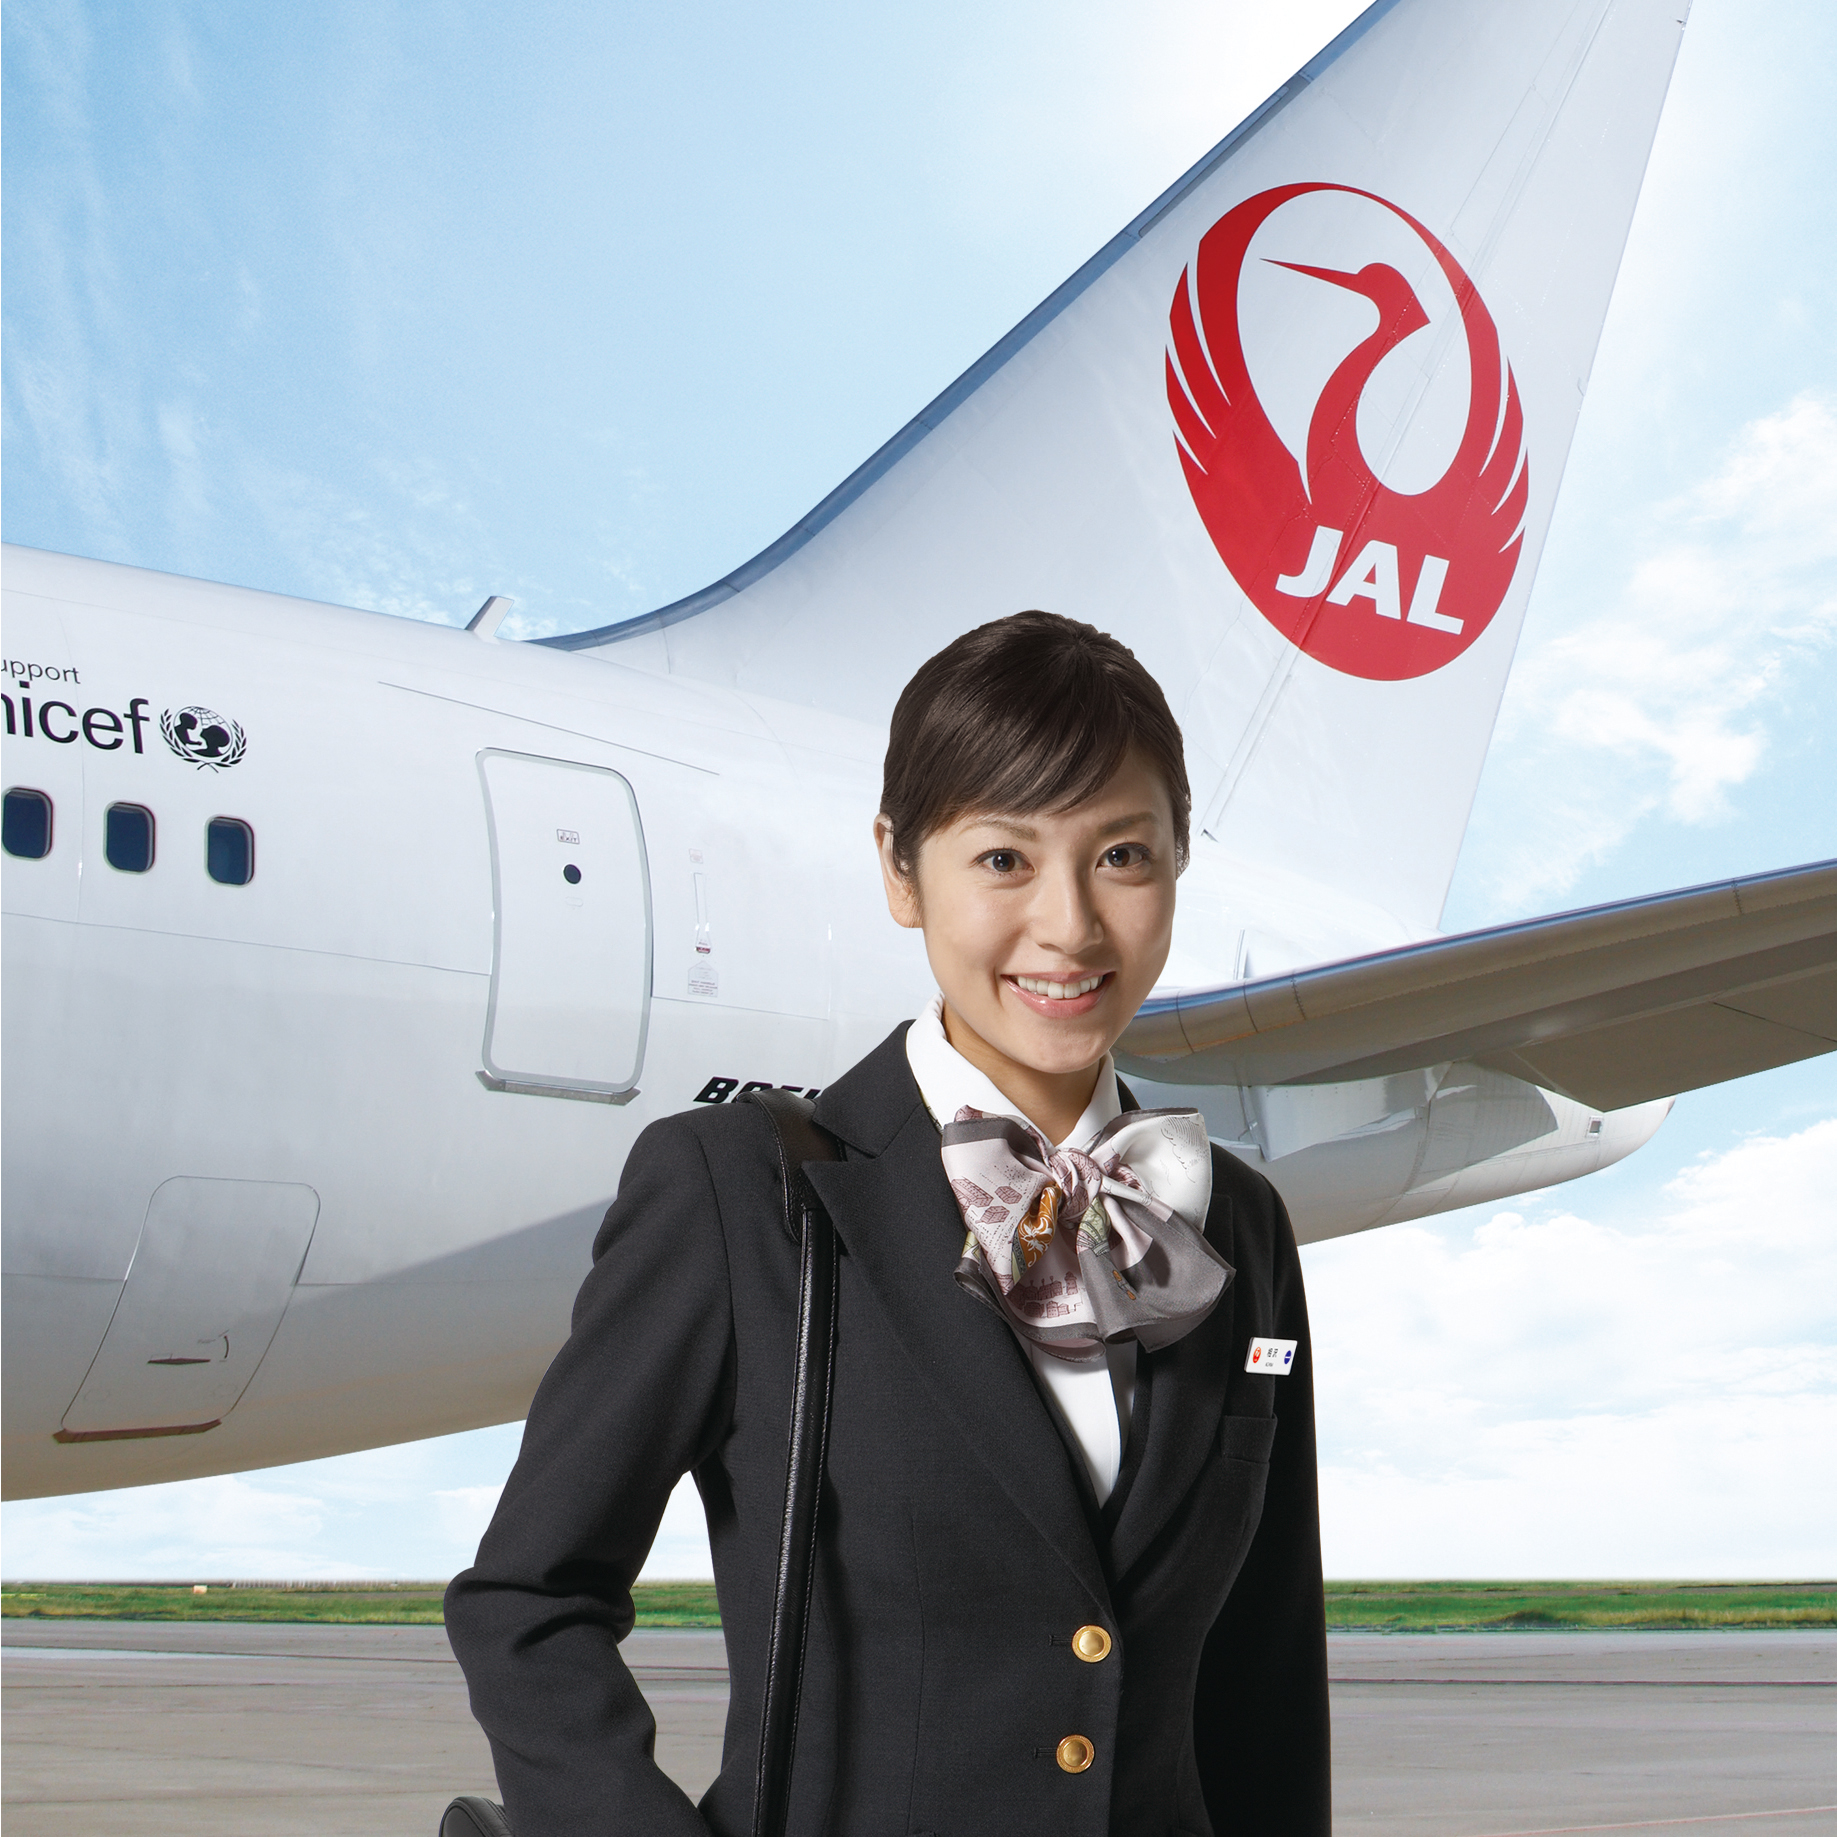 日本航空、客室乗務員を追加採用、路線便数計画変更で